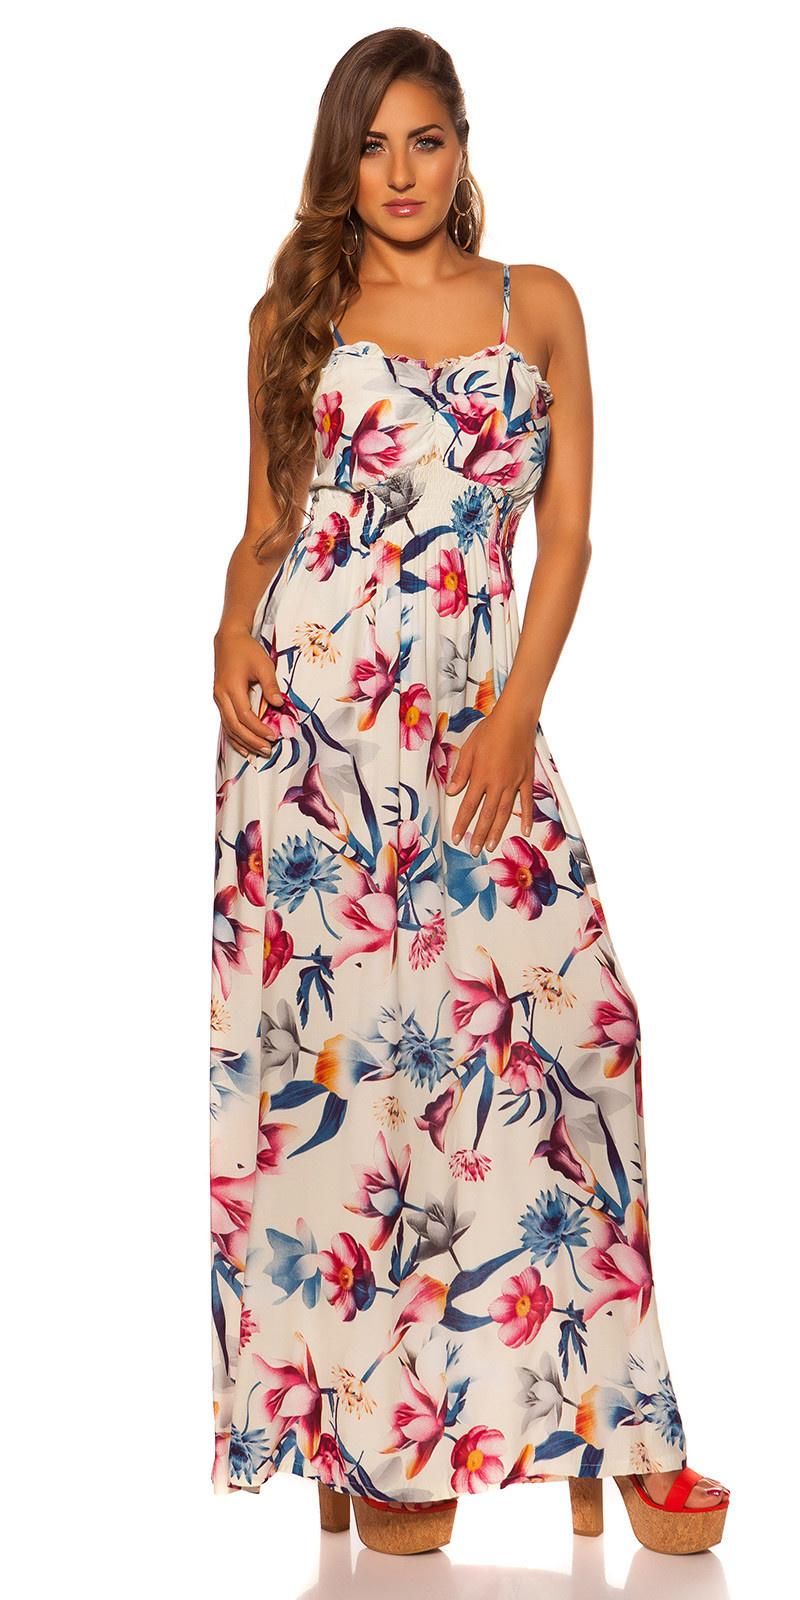 Sexy zomerjurk met bloemen-print cremewit